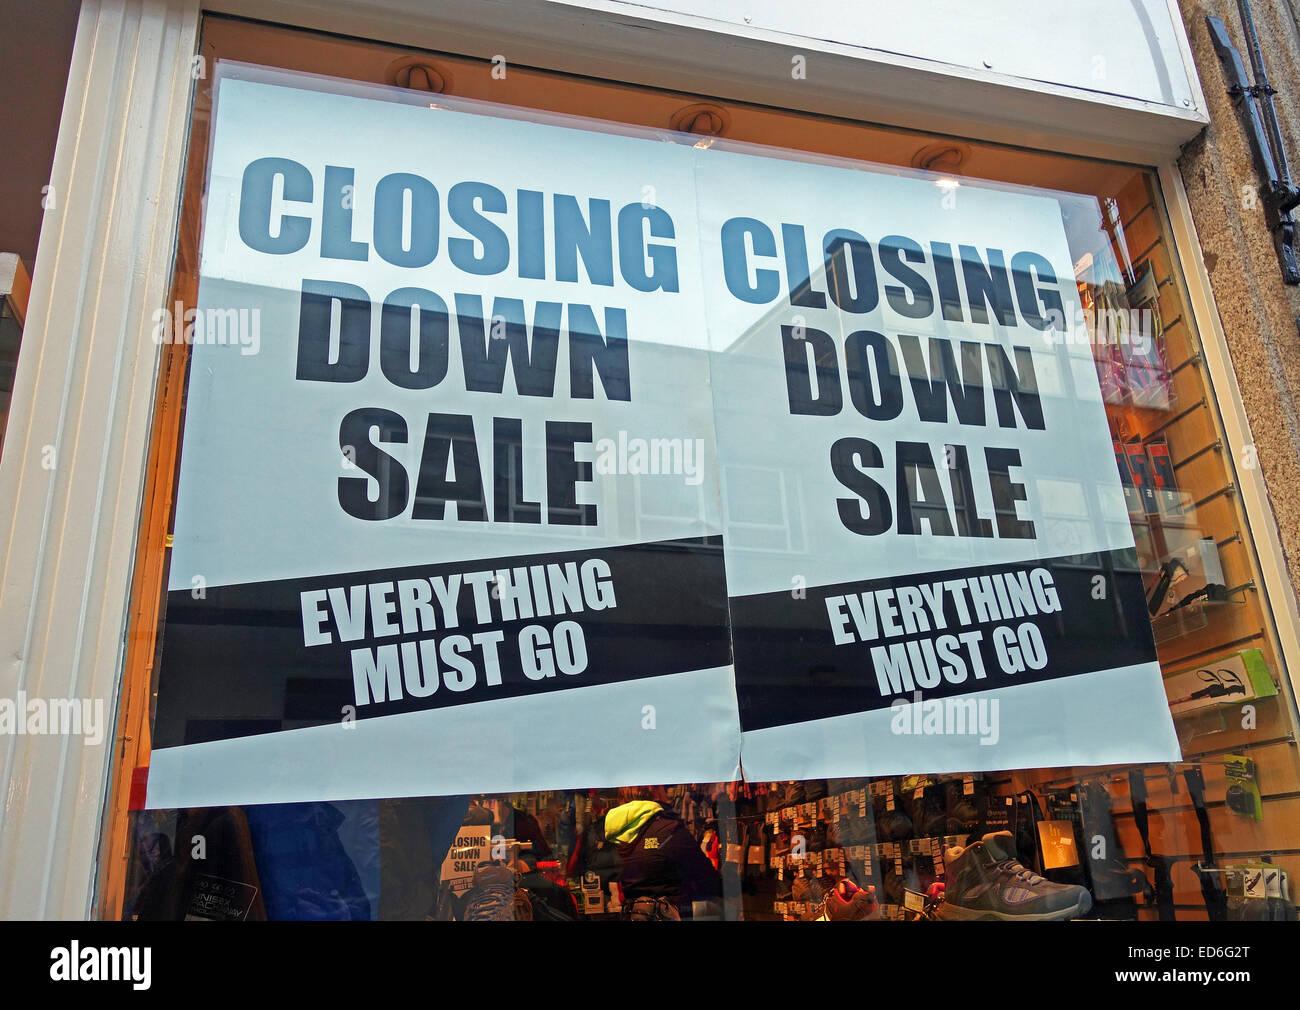 shop closing down sale - Stock Image